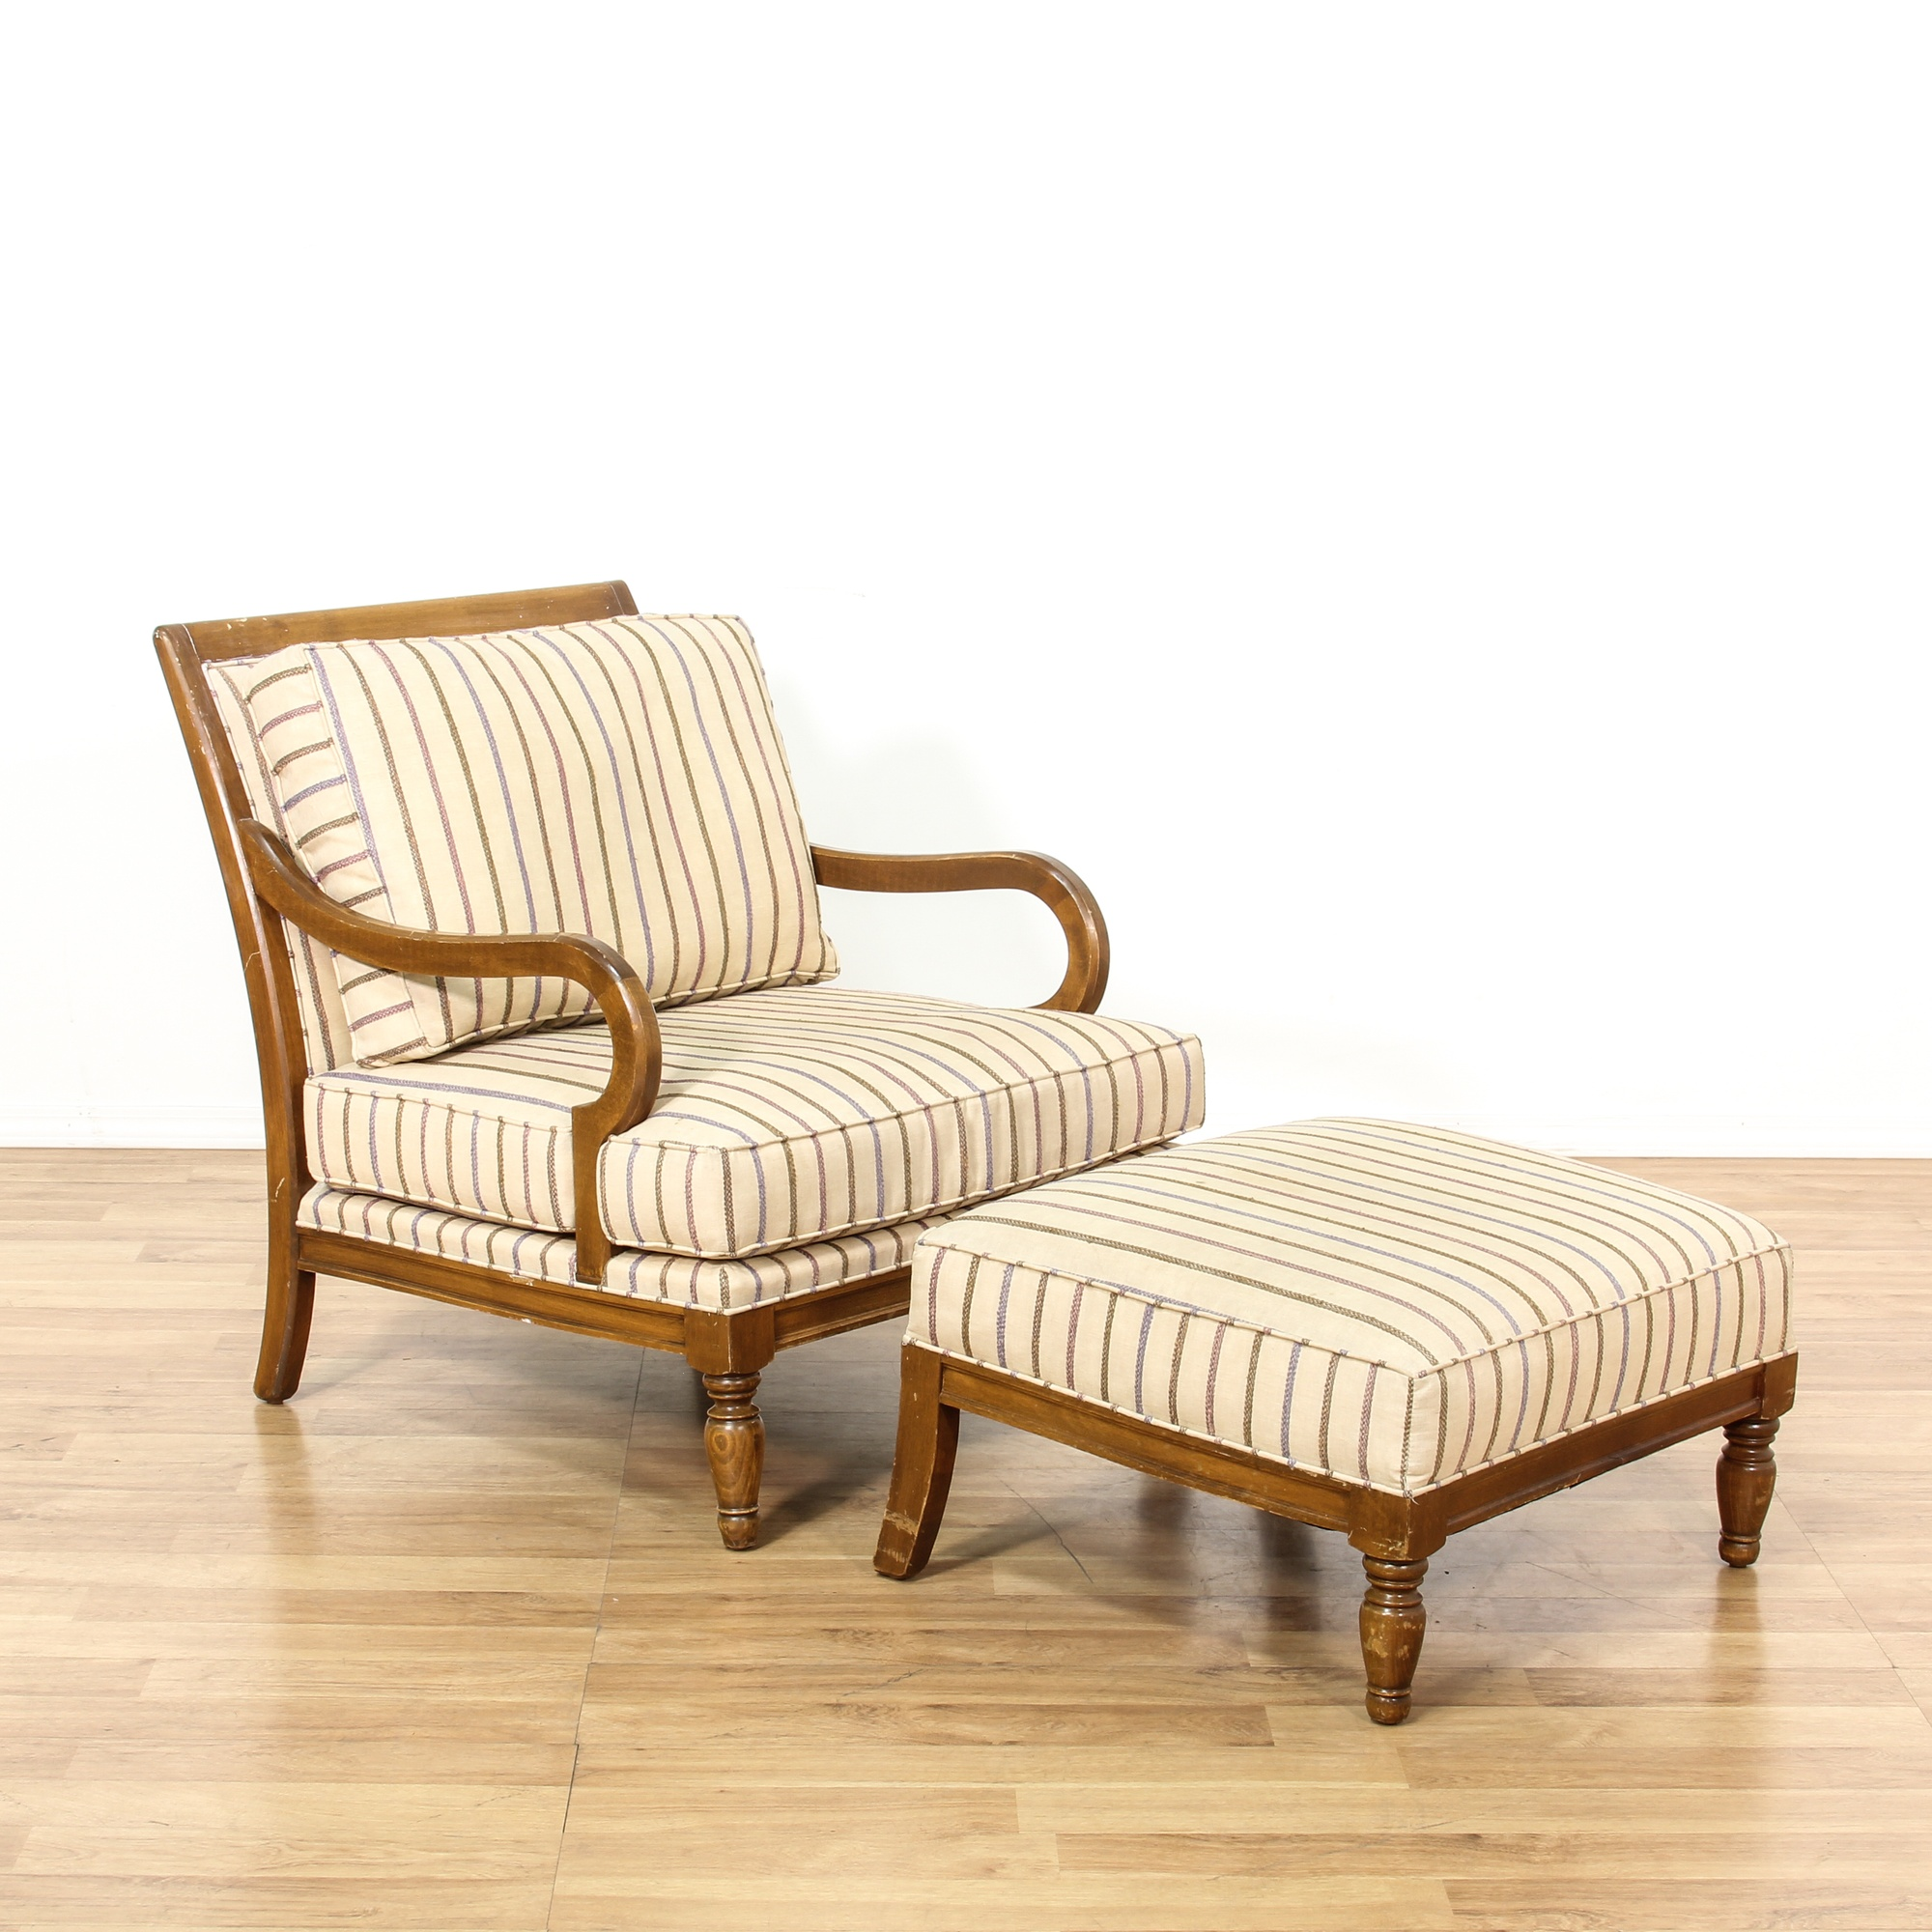 Alexander julian striped armchair ottoman set for G furniture los angeles